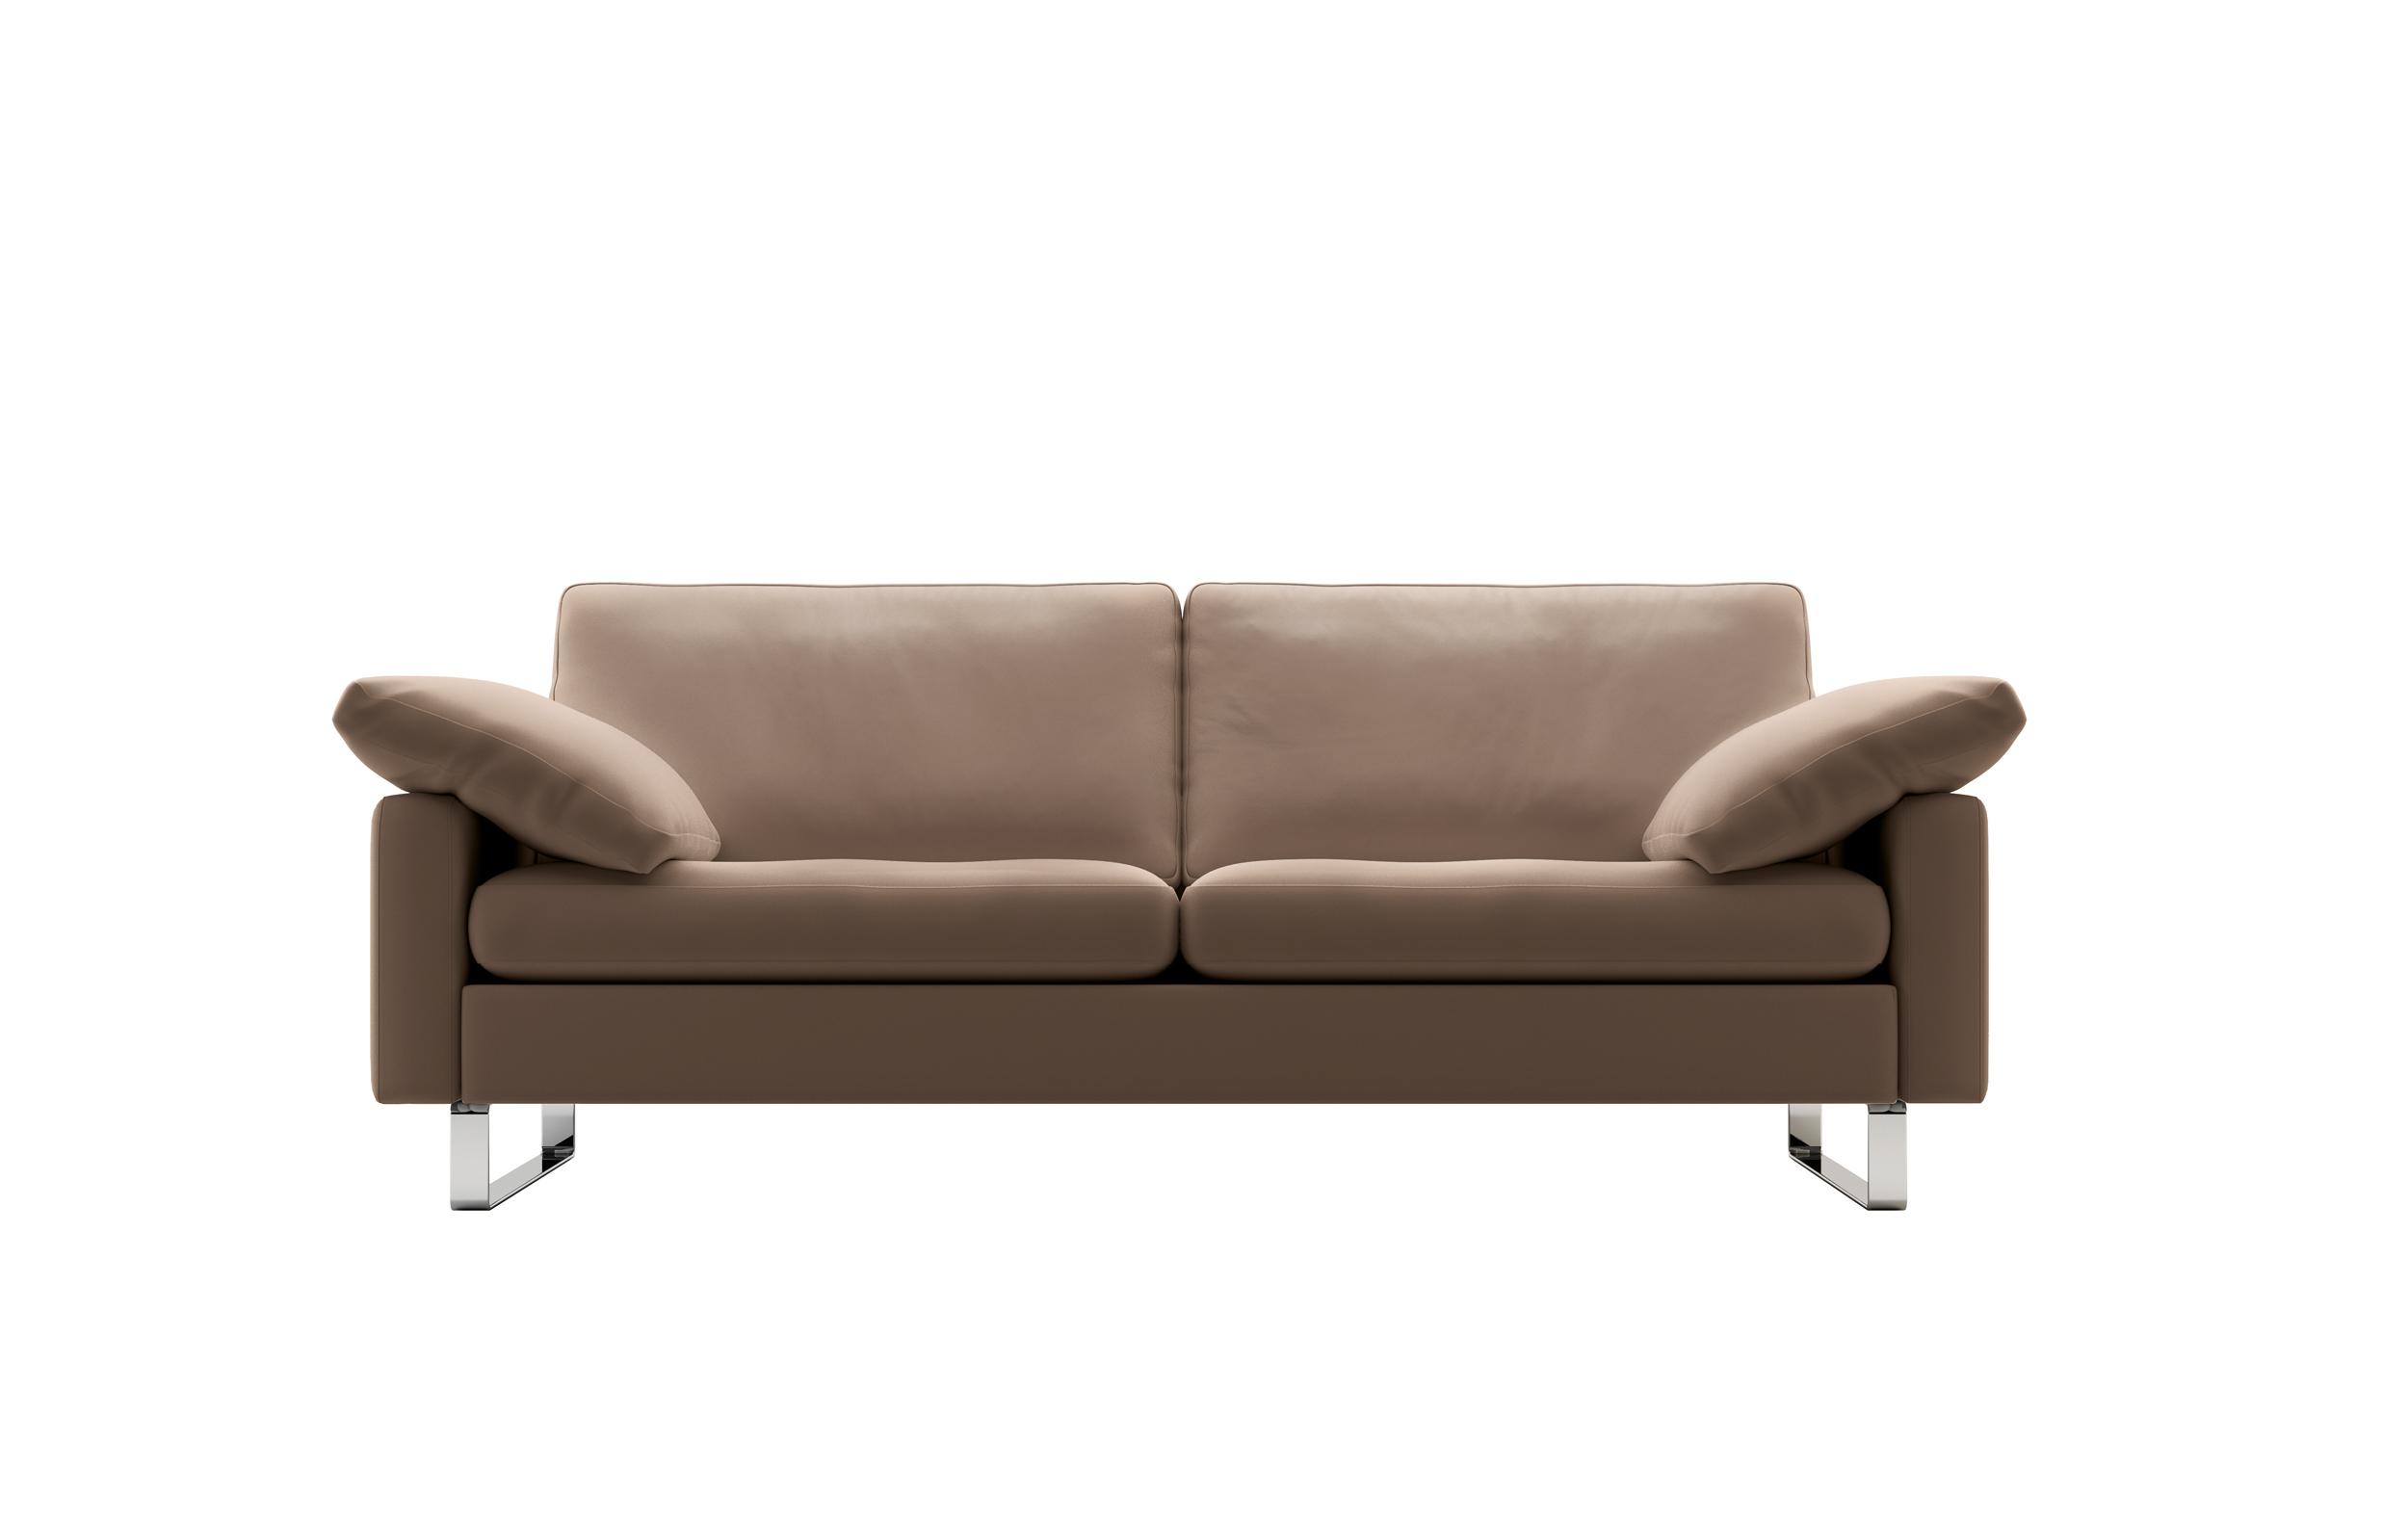 conseta sofa professional cor. Black Bedroom Furniture Sets. Home Design Ideas